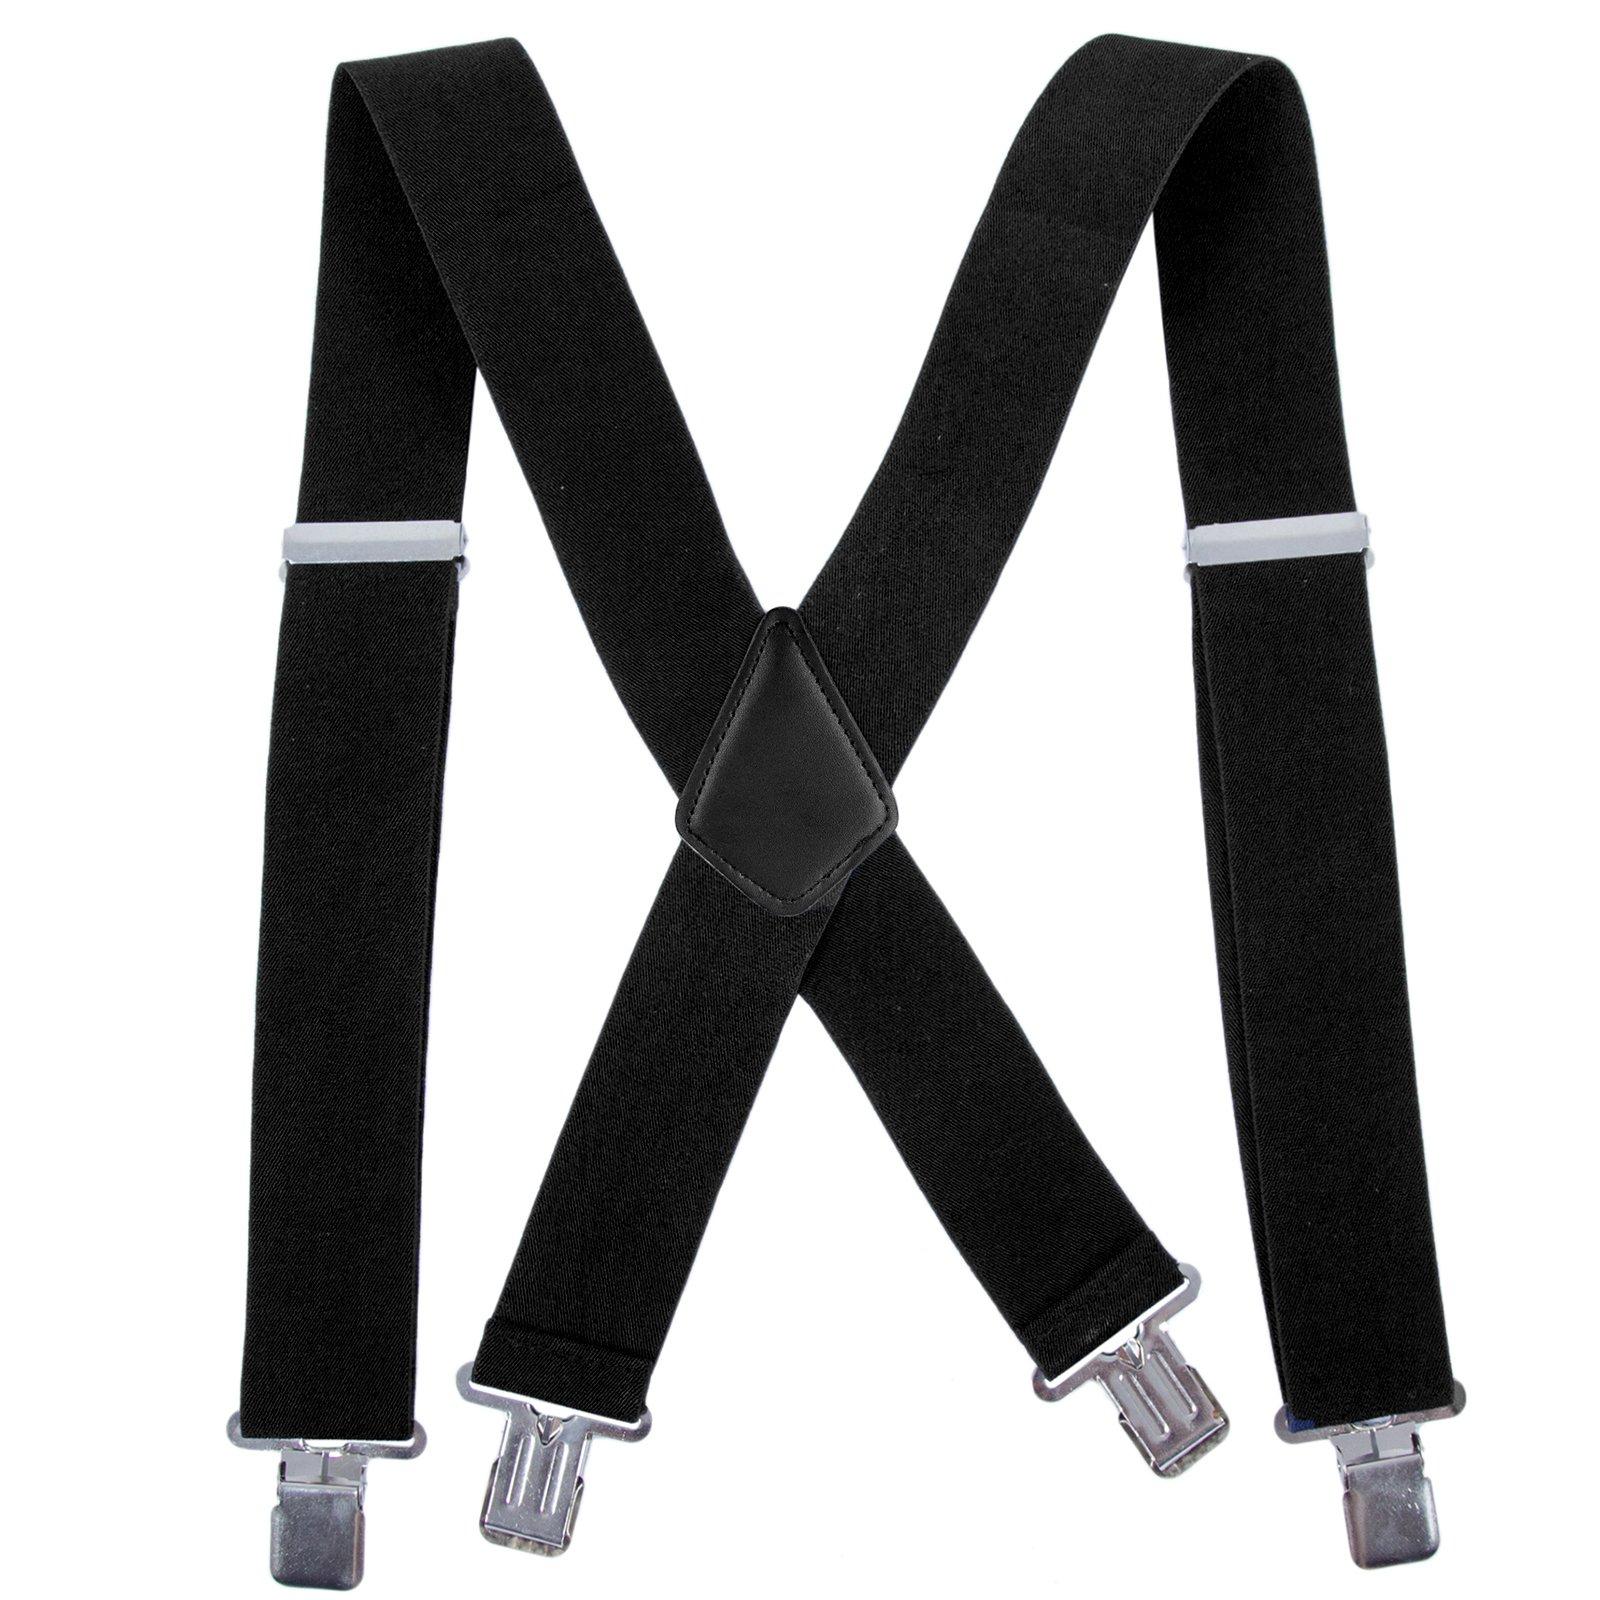 fb5ae98c1c2 Men Utility Suspenders Adjustable Elastic - Heavy Duty 2 Inch Wide X Shape  Strong Clip Suspender